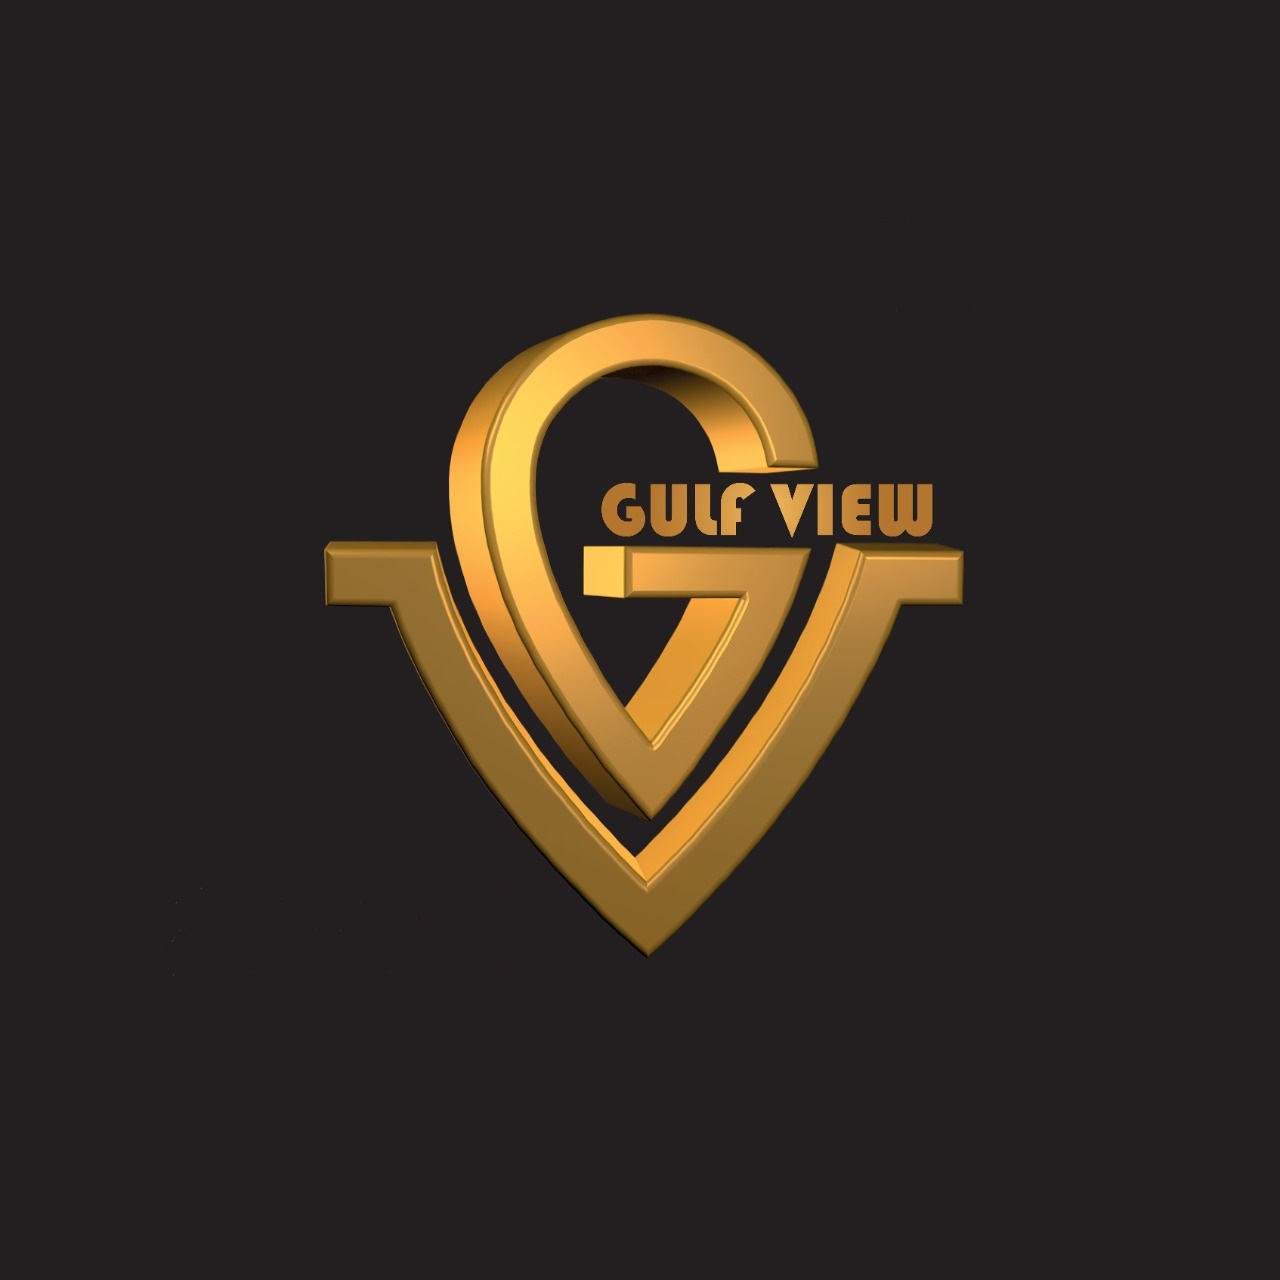 GULF-VIEW